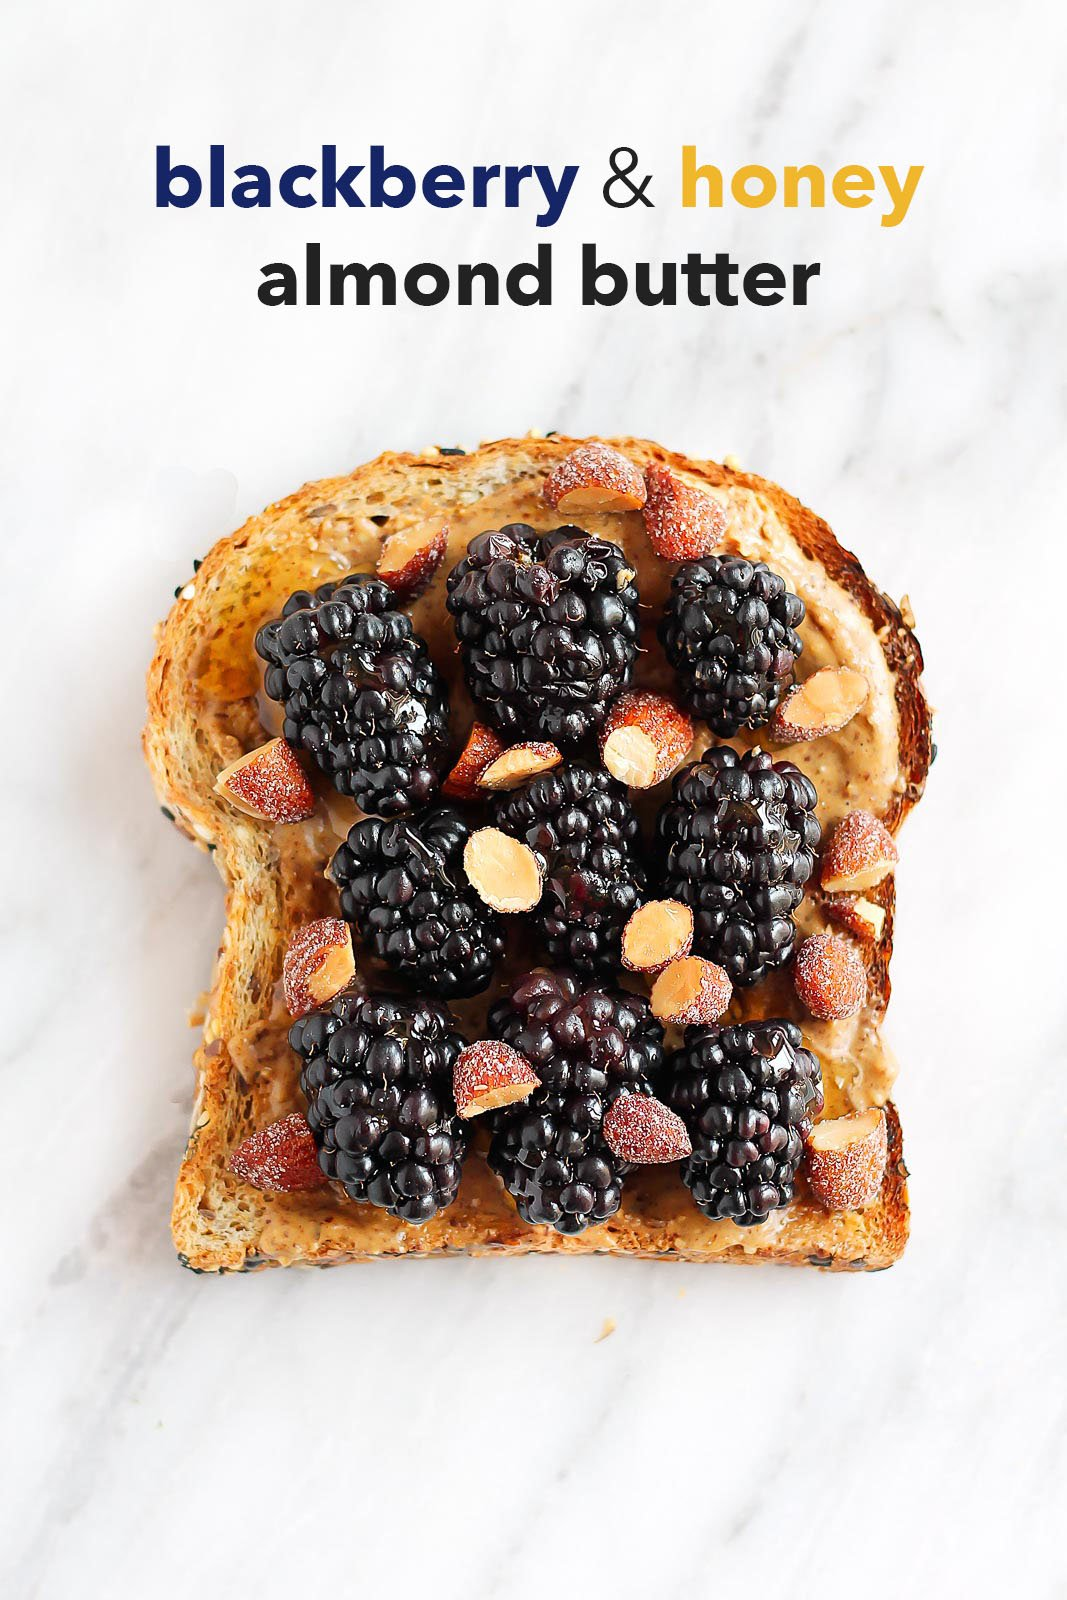 Blackberry & honey almond butter breakfast toast + healthy toast toppings!